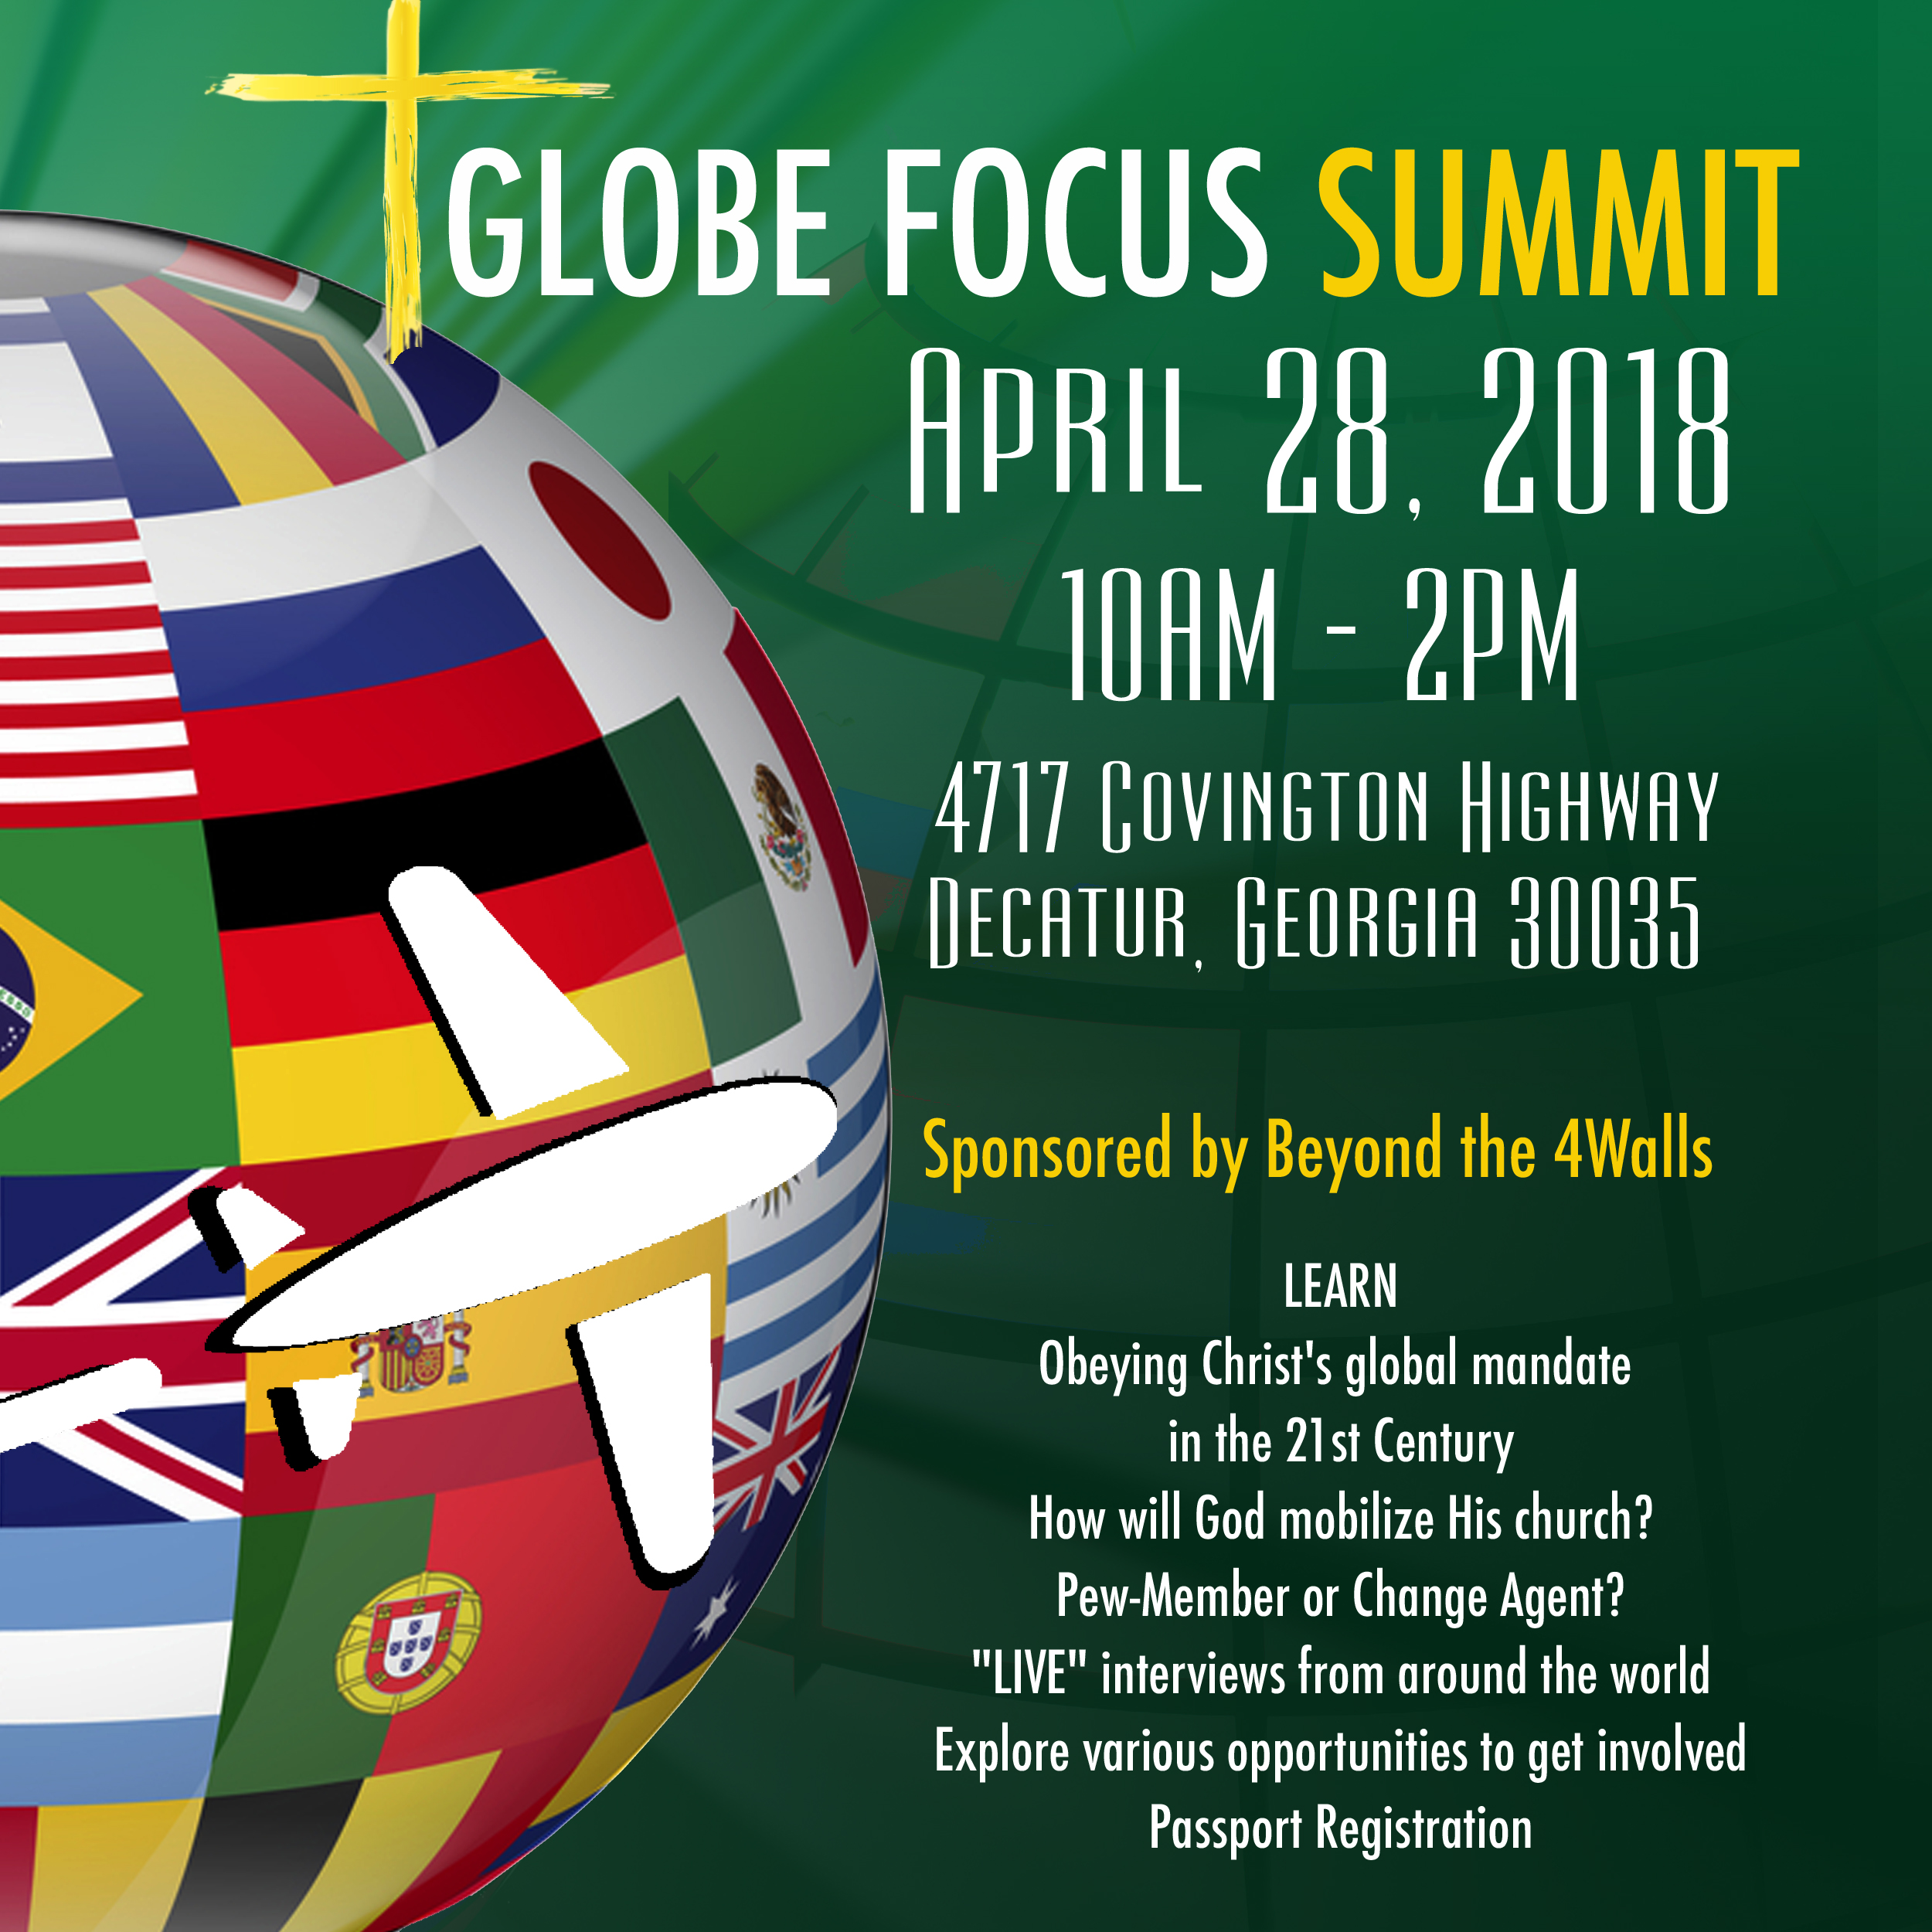 GLOBAL FOCUS SUMMIT